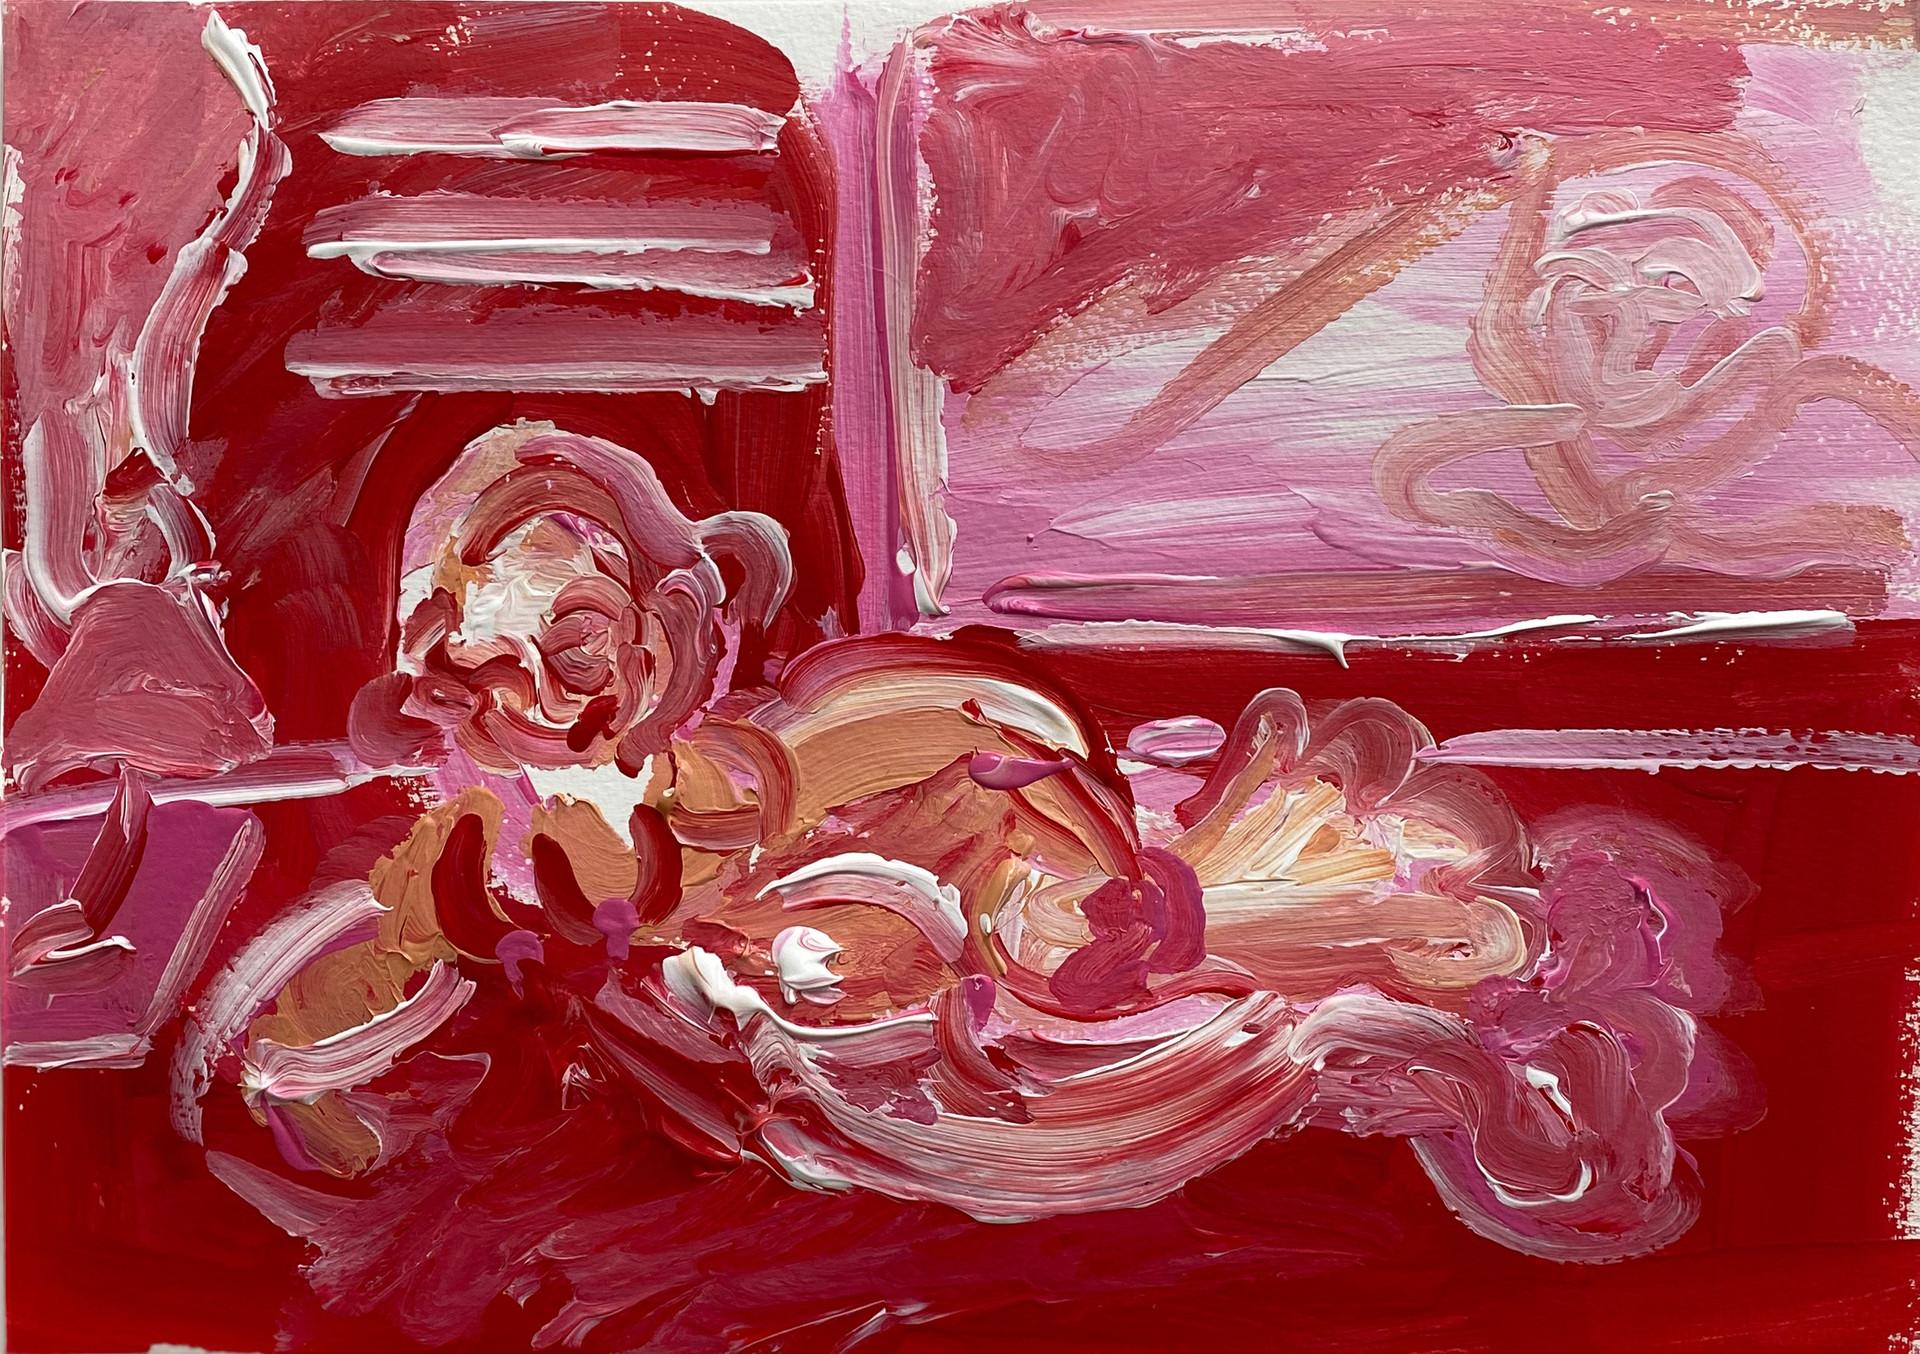 Rouge, 2020, acrylic on fine art paper, 29.5 x 21 cm